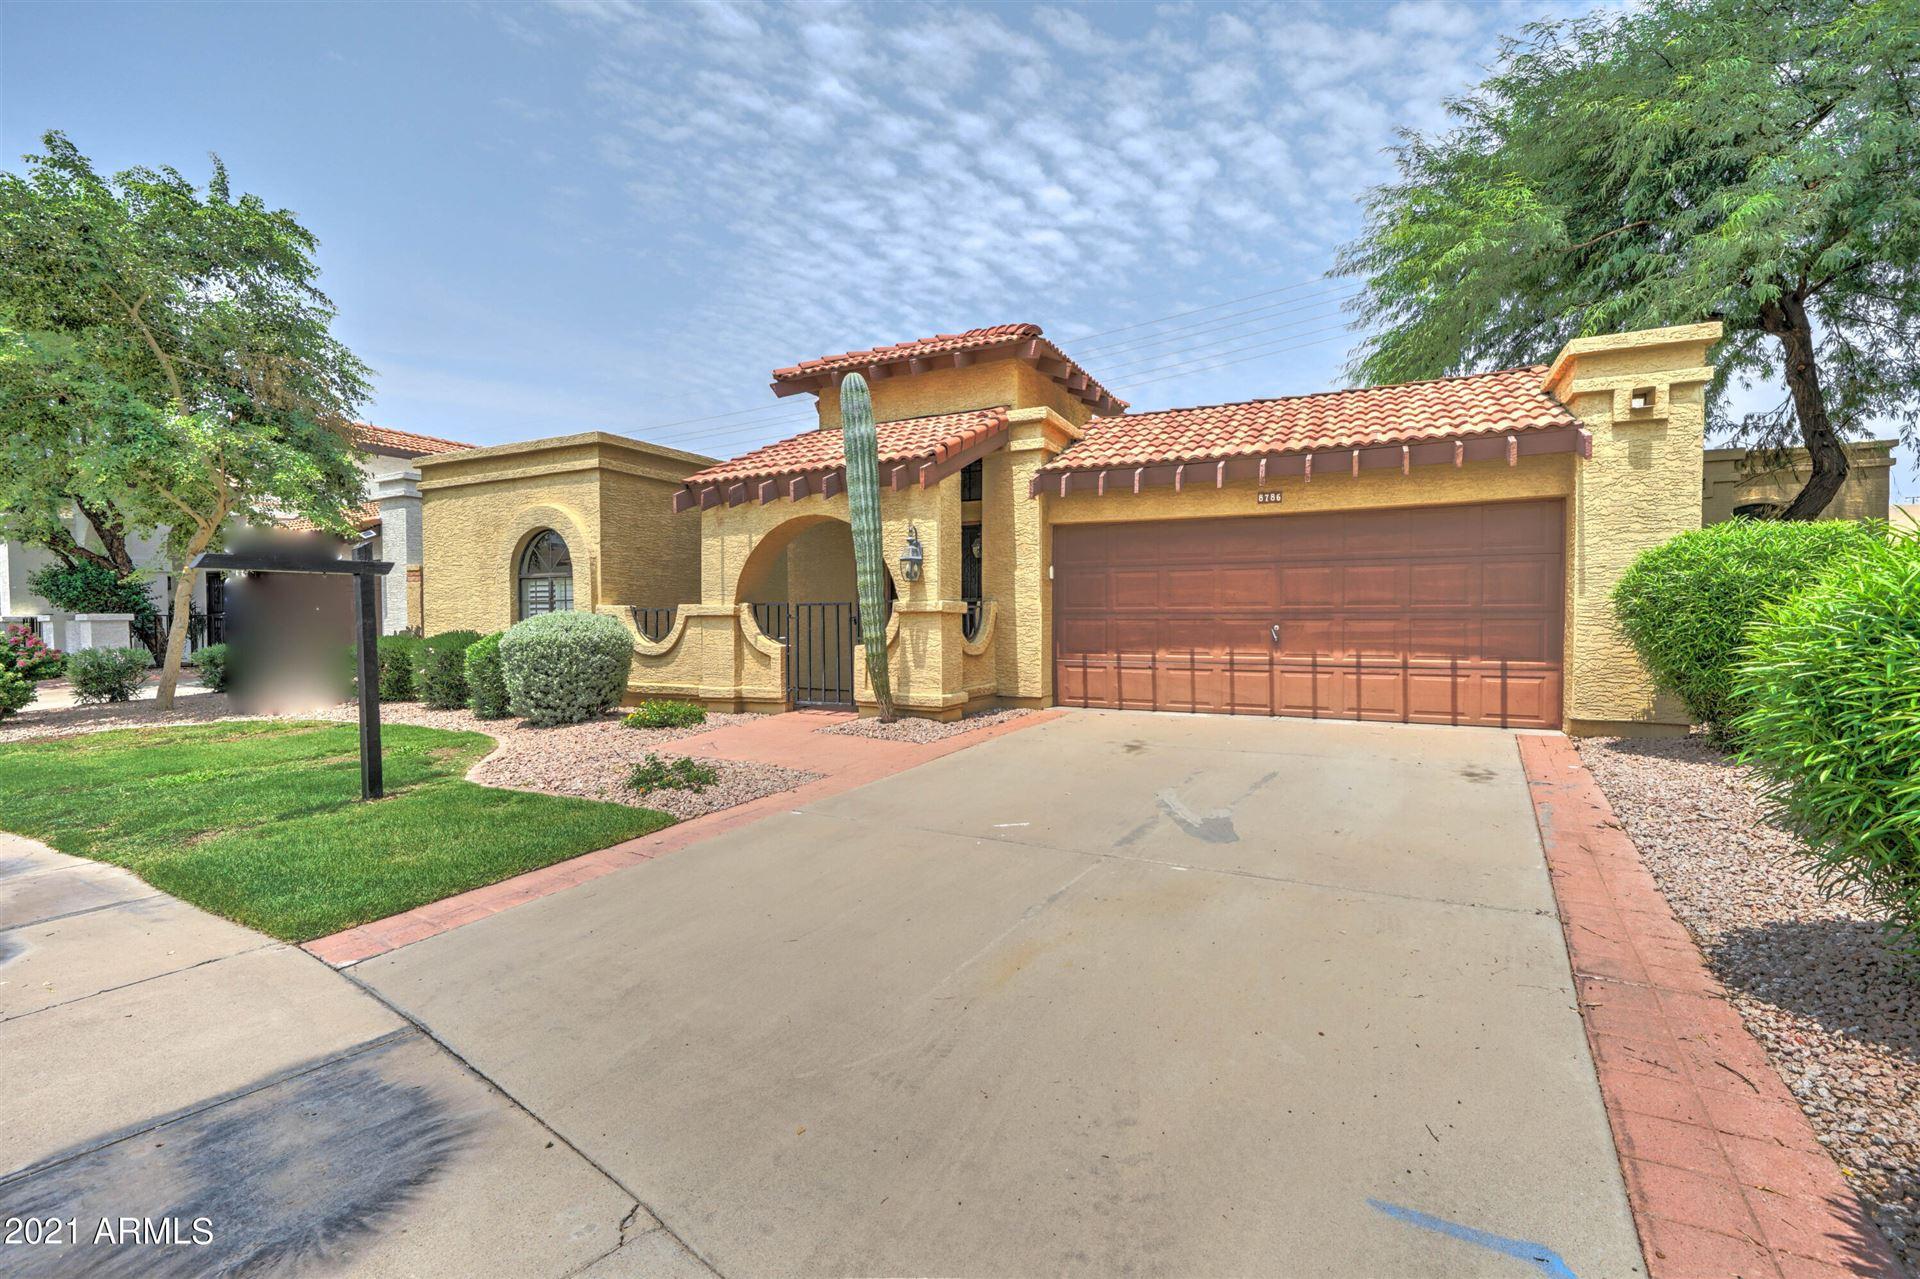 Photo of 8786 E APPALOOSA Trail, Scottsdale, AZ 85258 (MLS # 6263311)